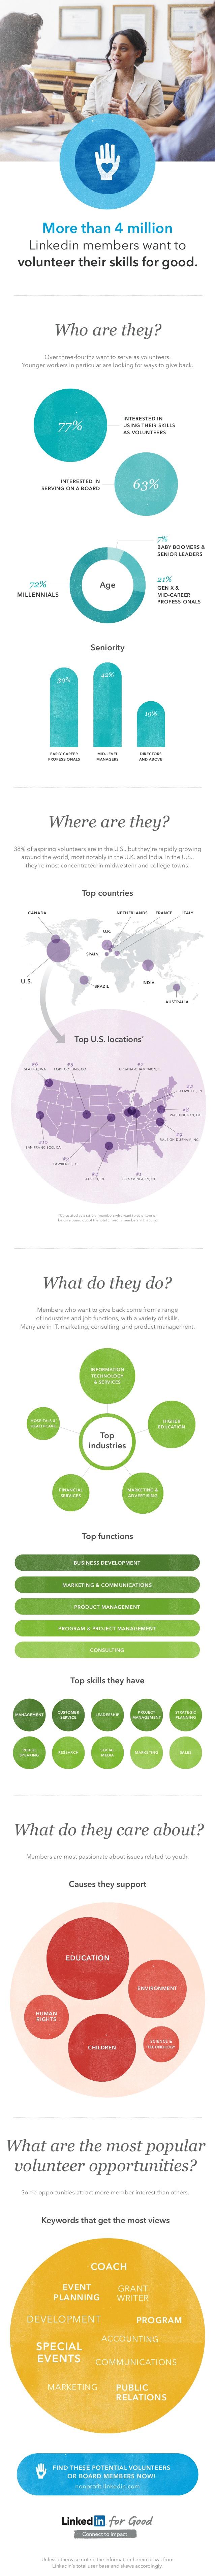 Skills-based volunteering/ pro bono consulting Infographic via LinkedIn Slideshare